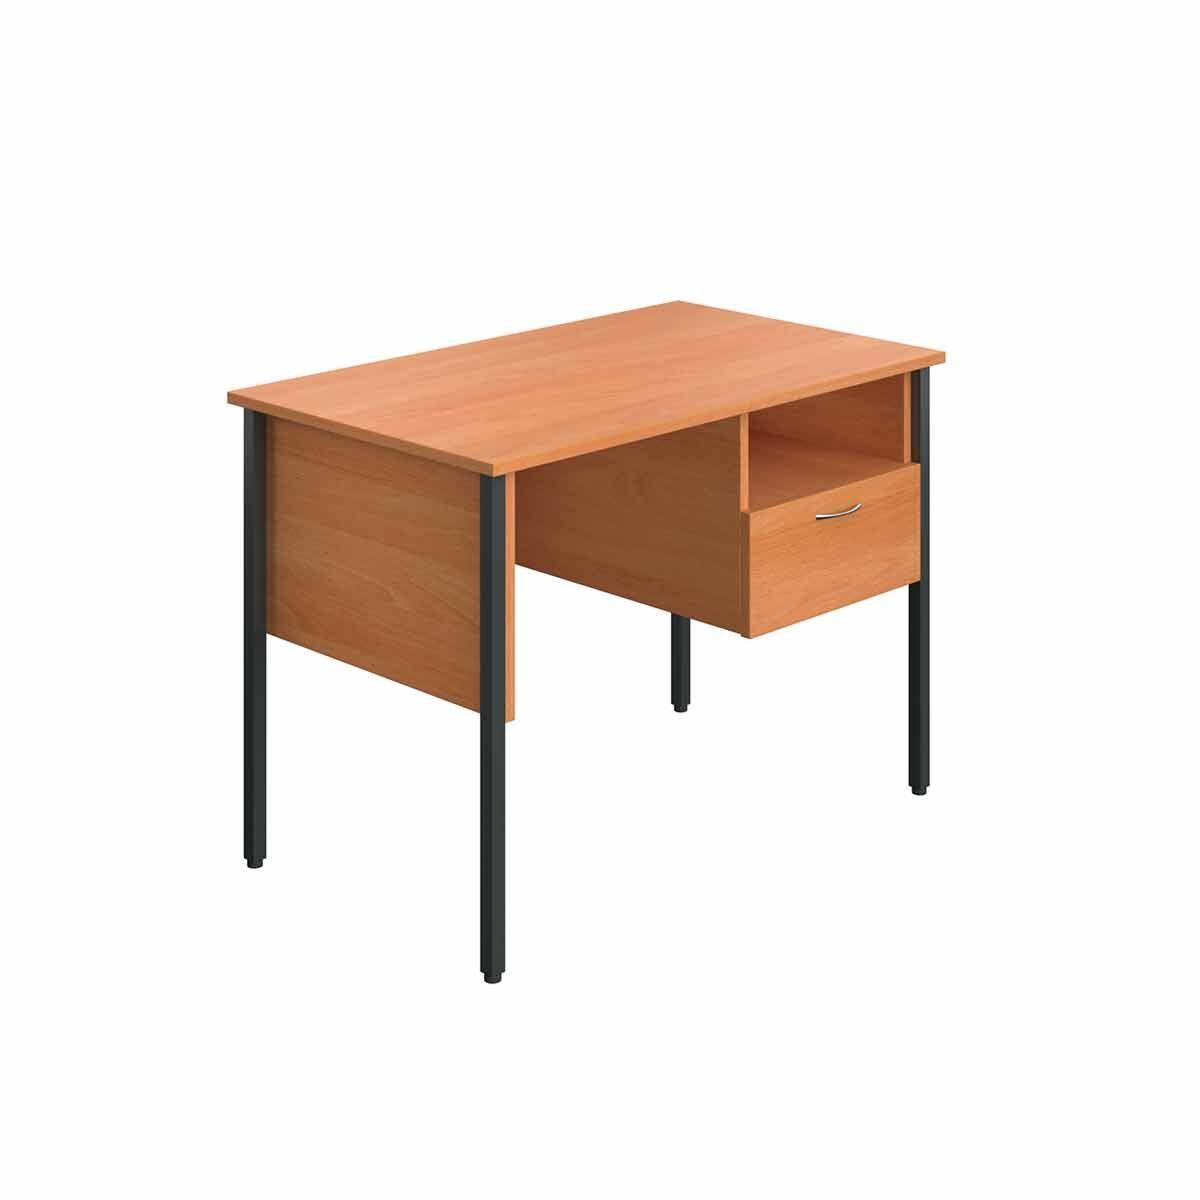 TC Office Eco 4 Leg Homework Desk with Drawer 100cm Beech